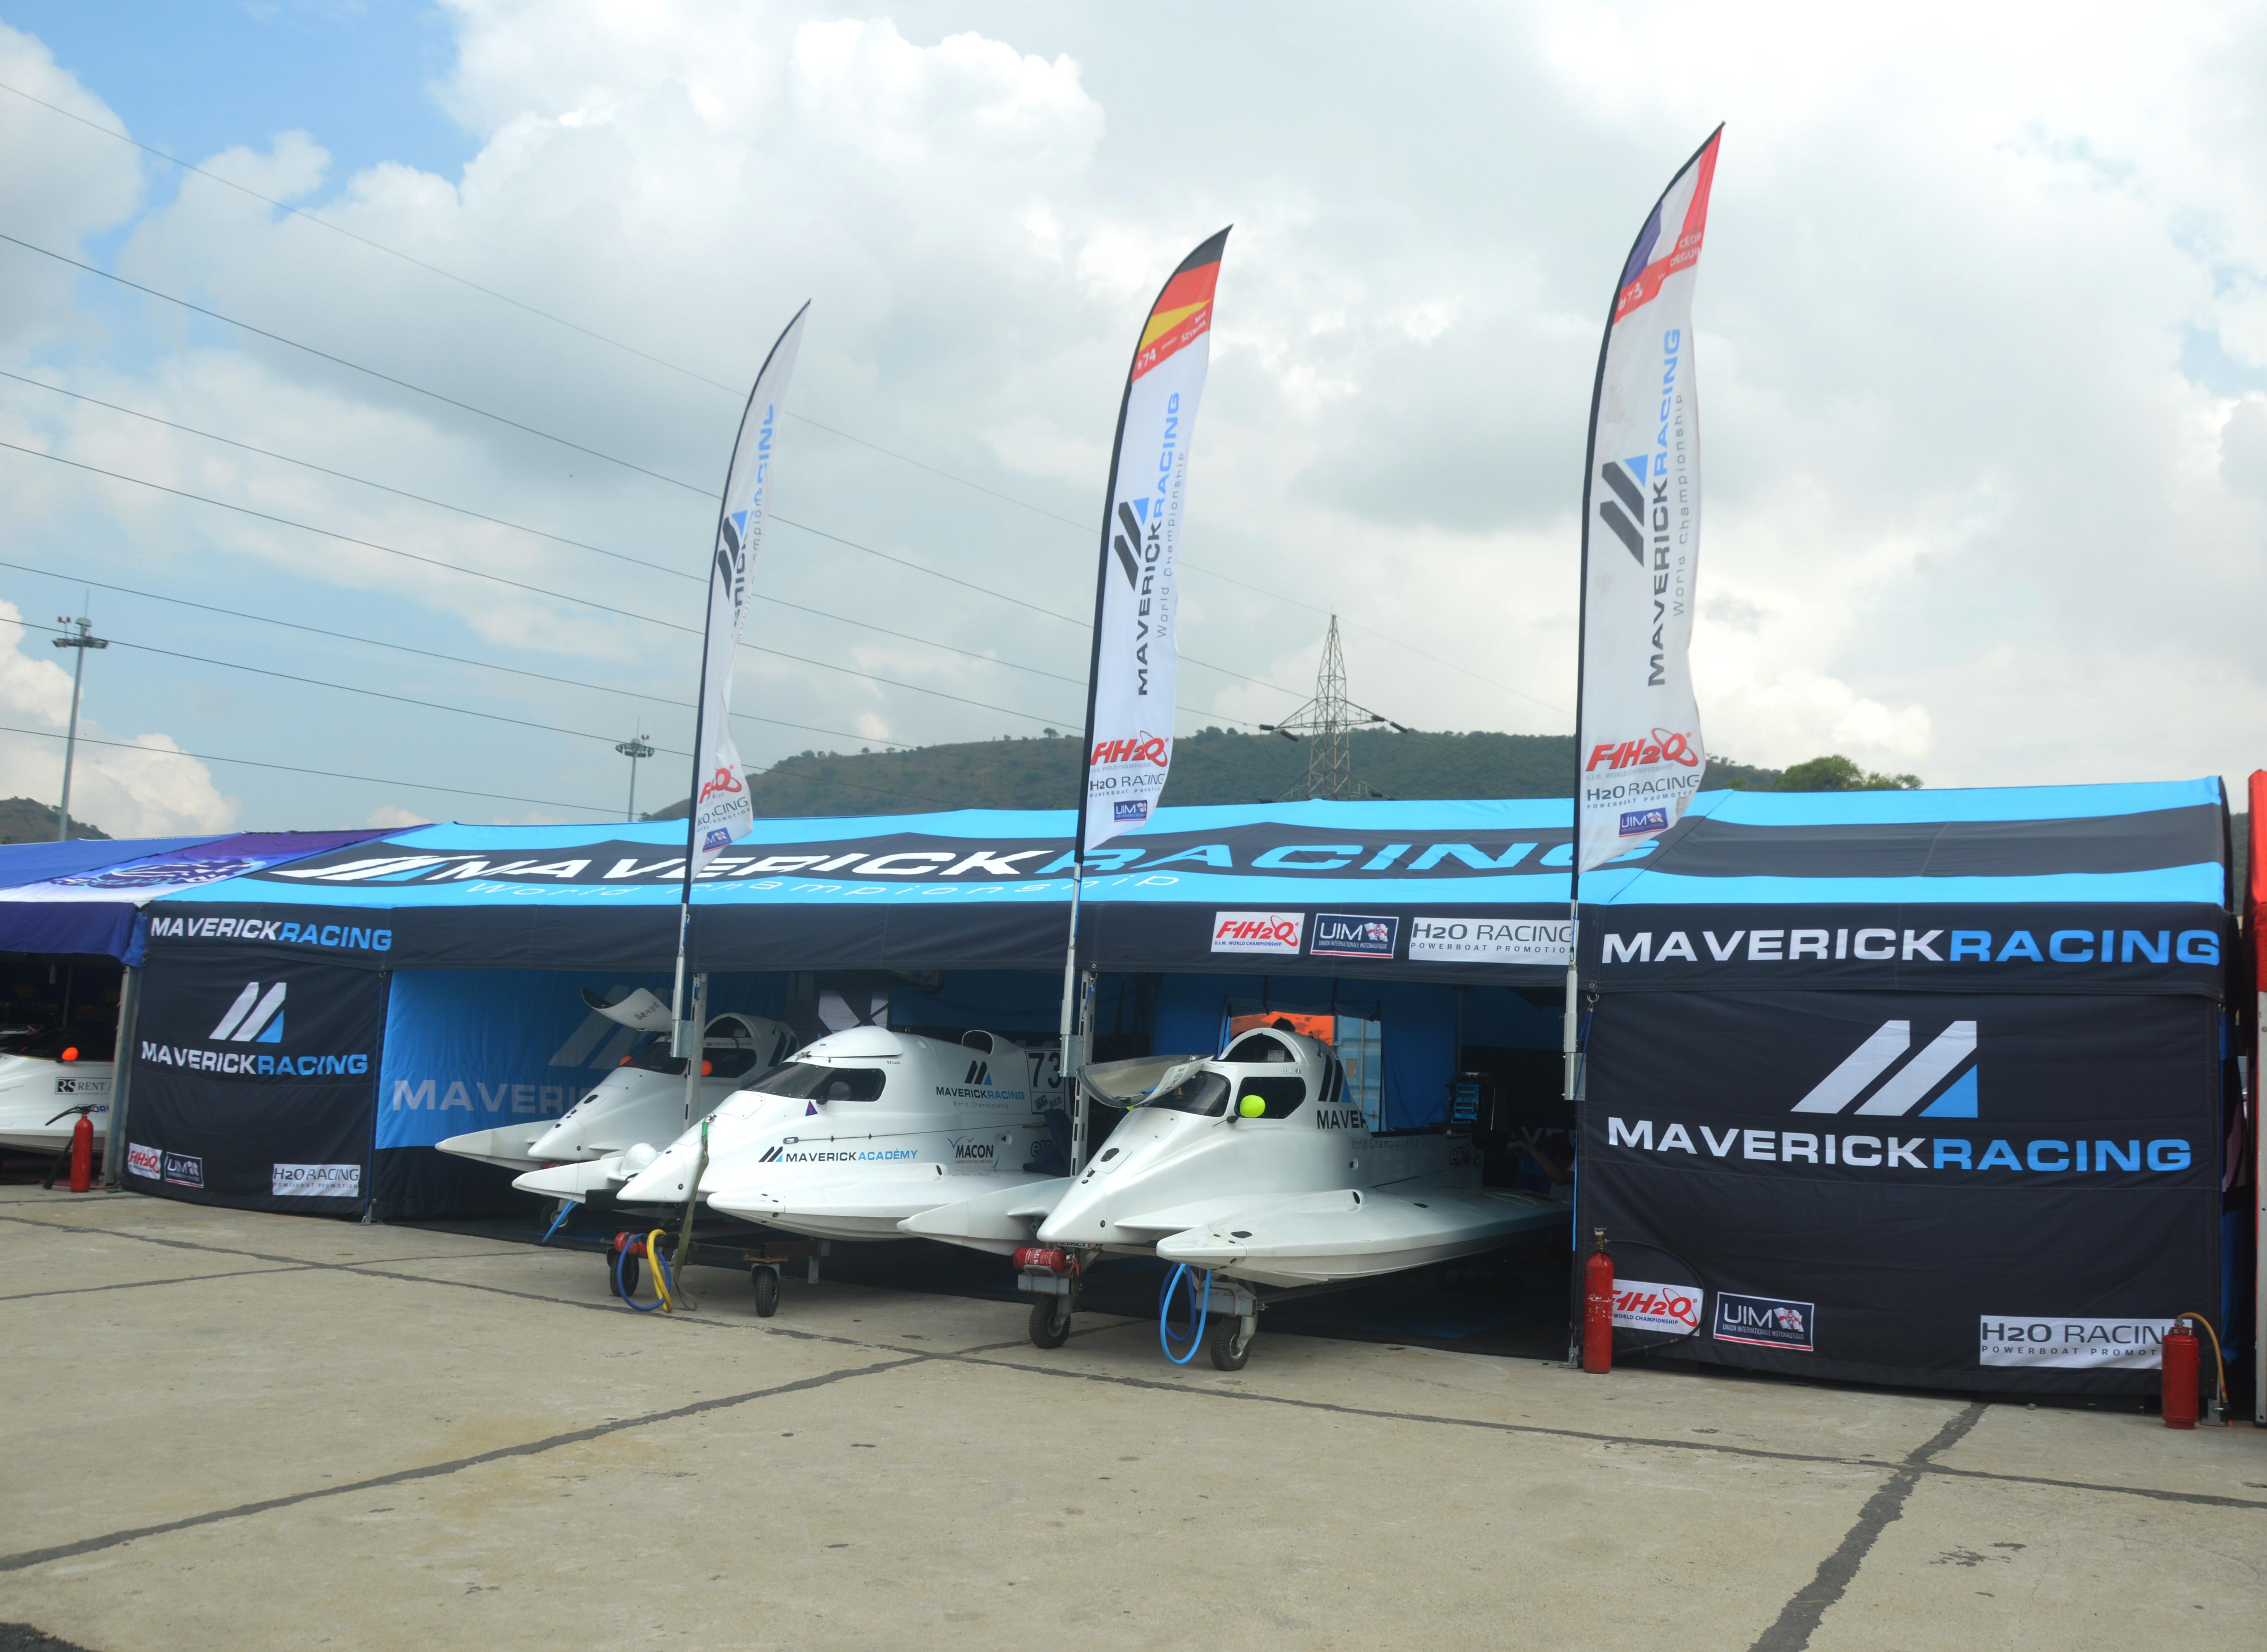 File:Maverick Racing team's pit stop (F1H2O Amaravathi) jpg